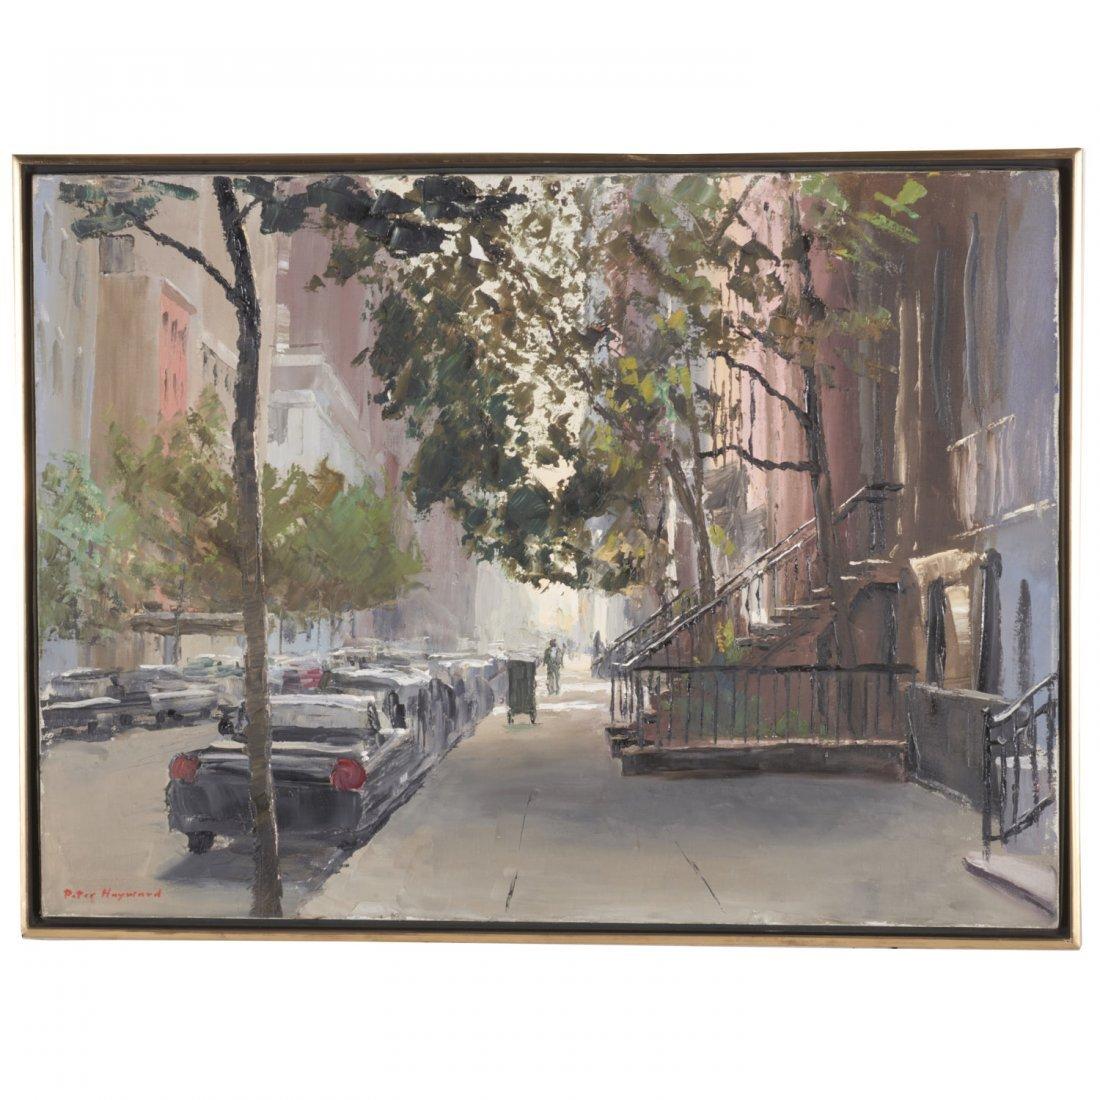 Peter Hayward, painting